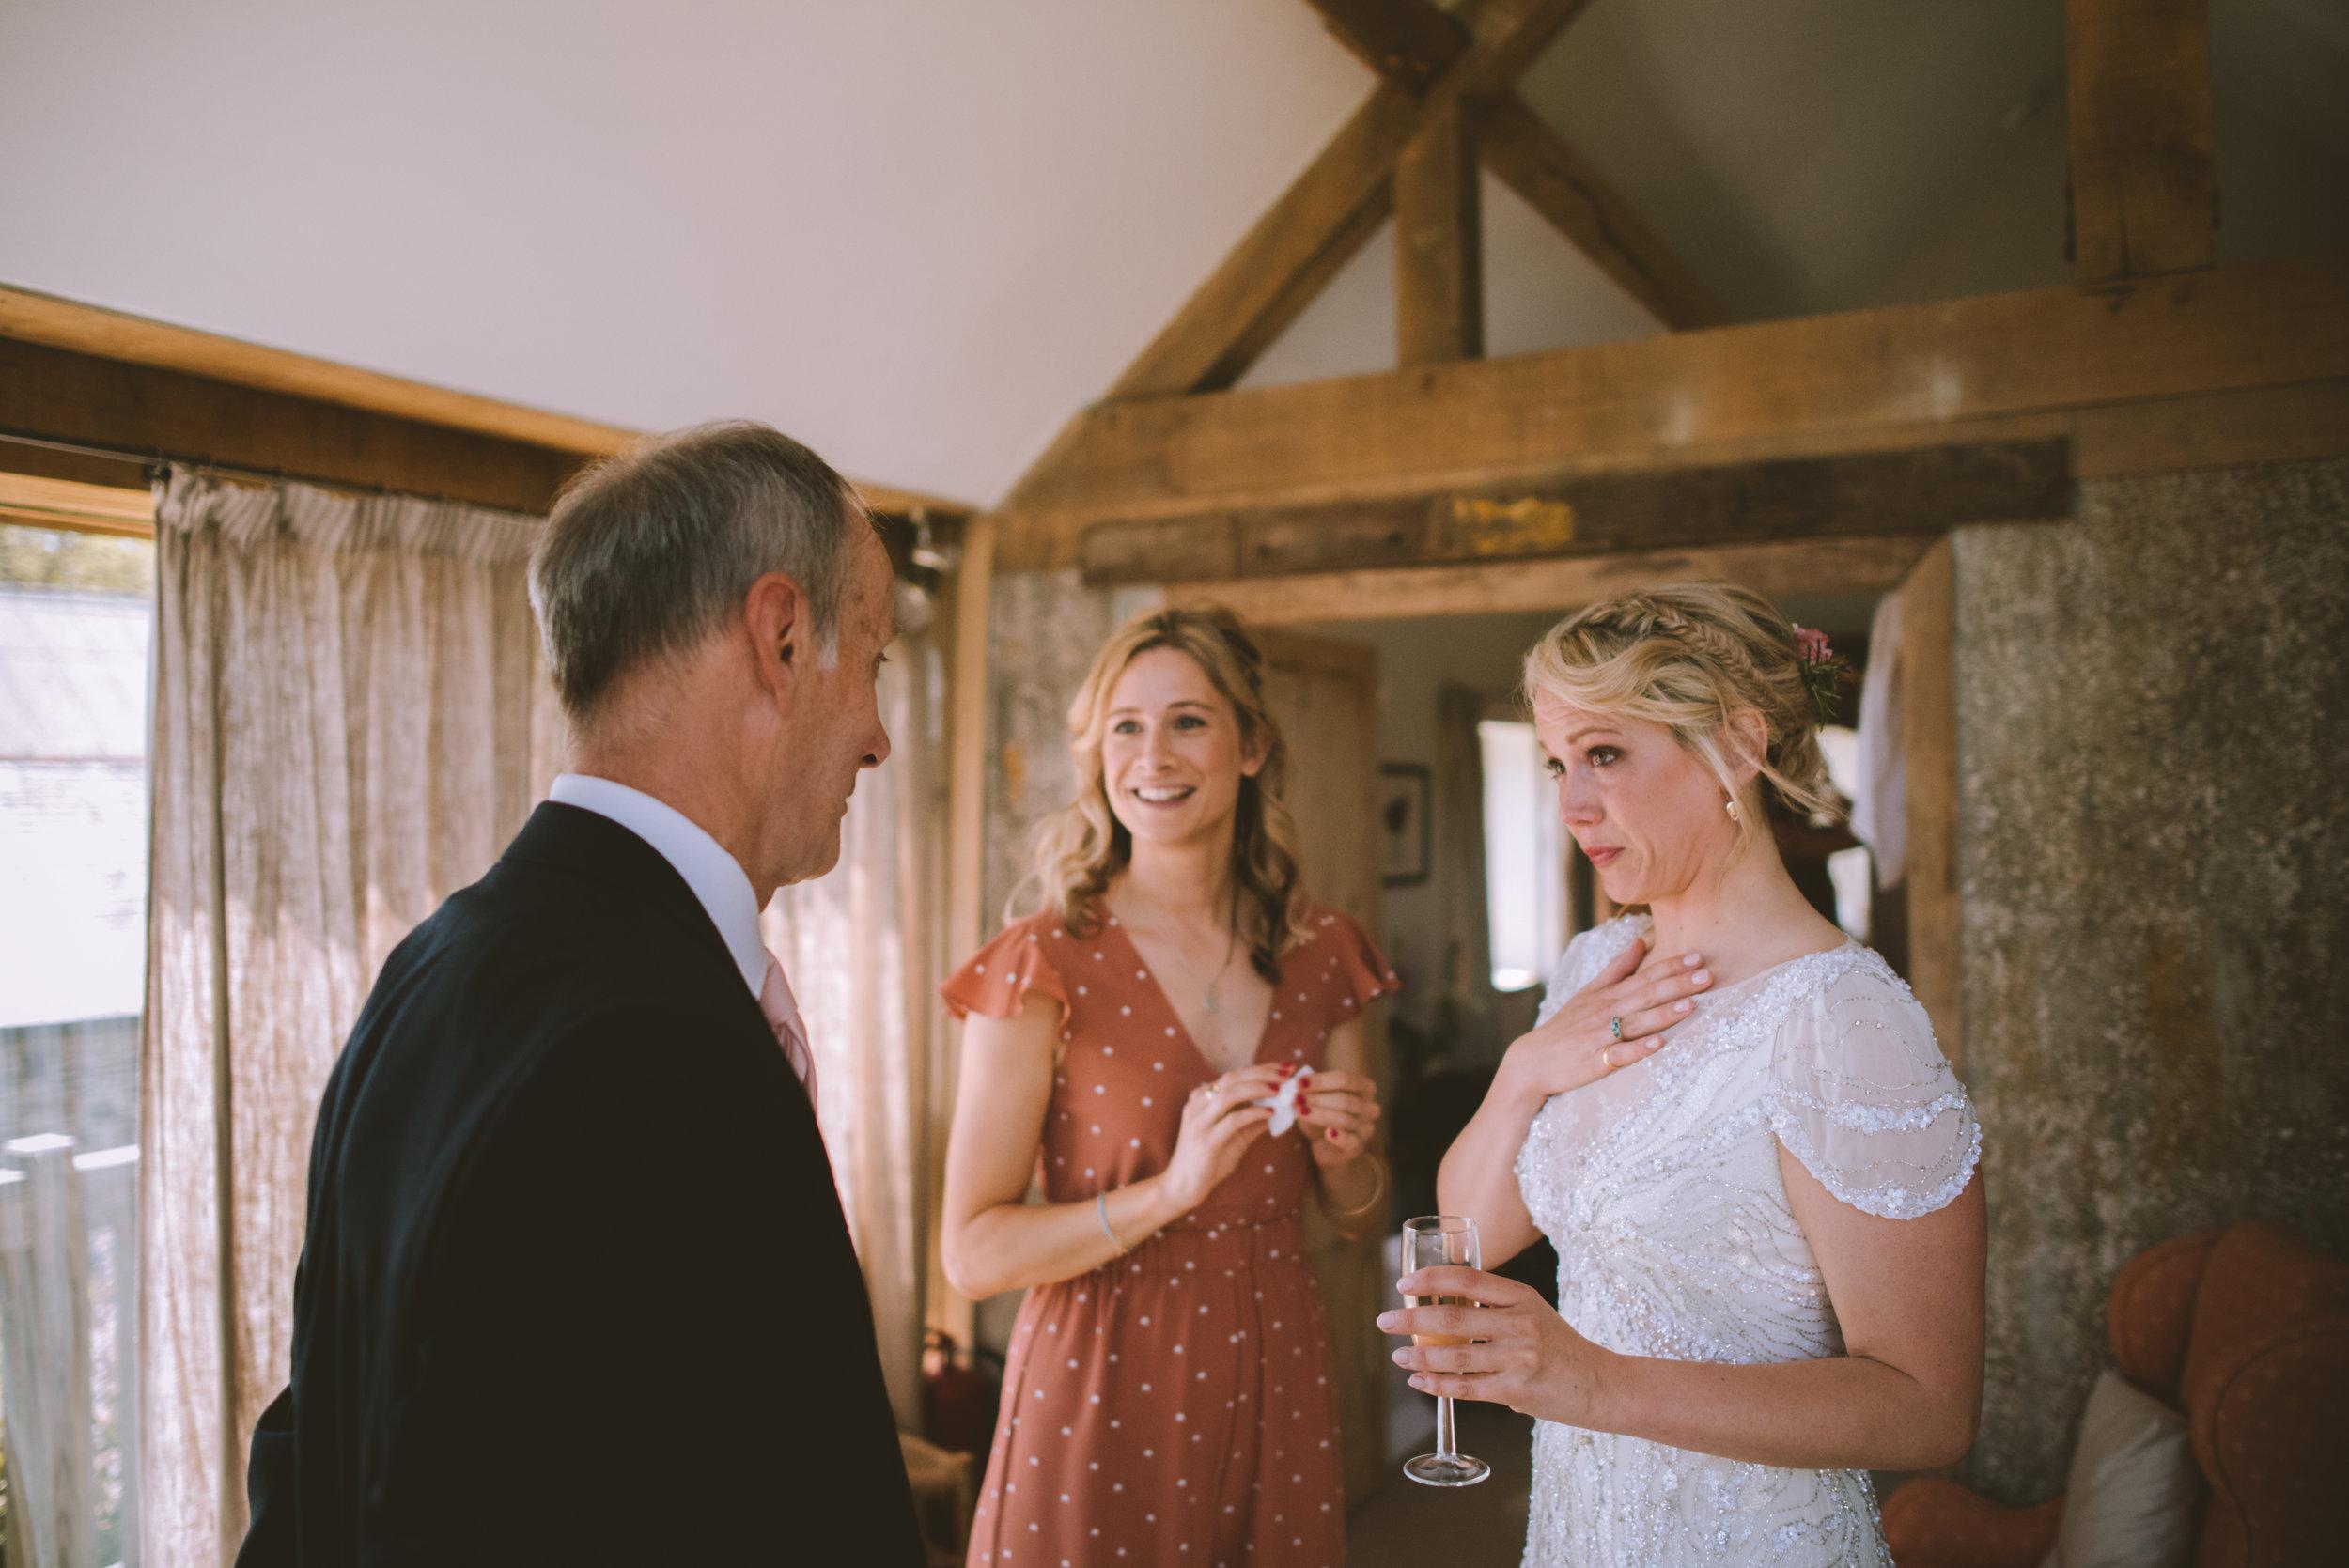 nancarrow-wedding-photography-26.jpg